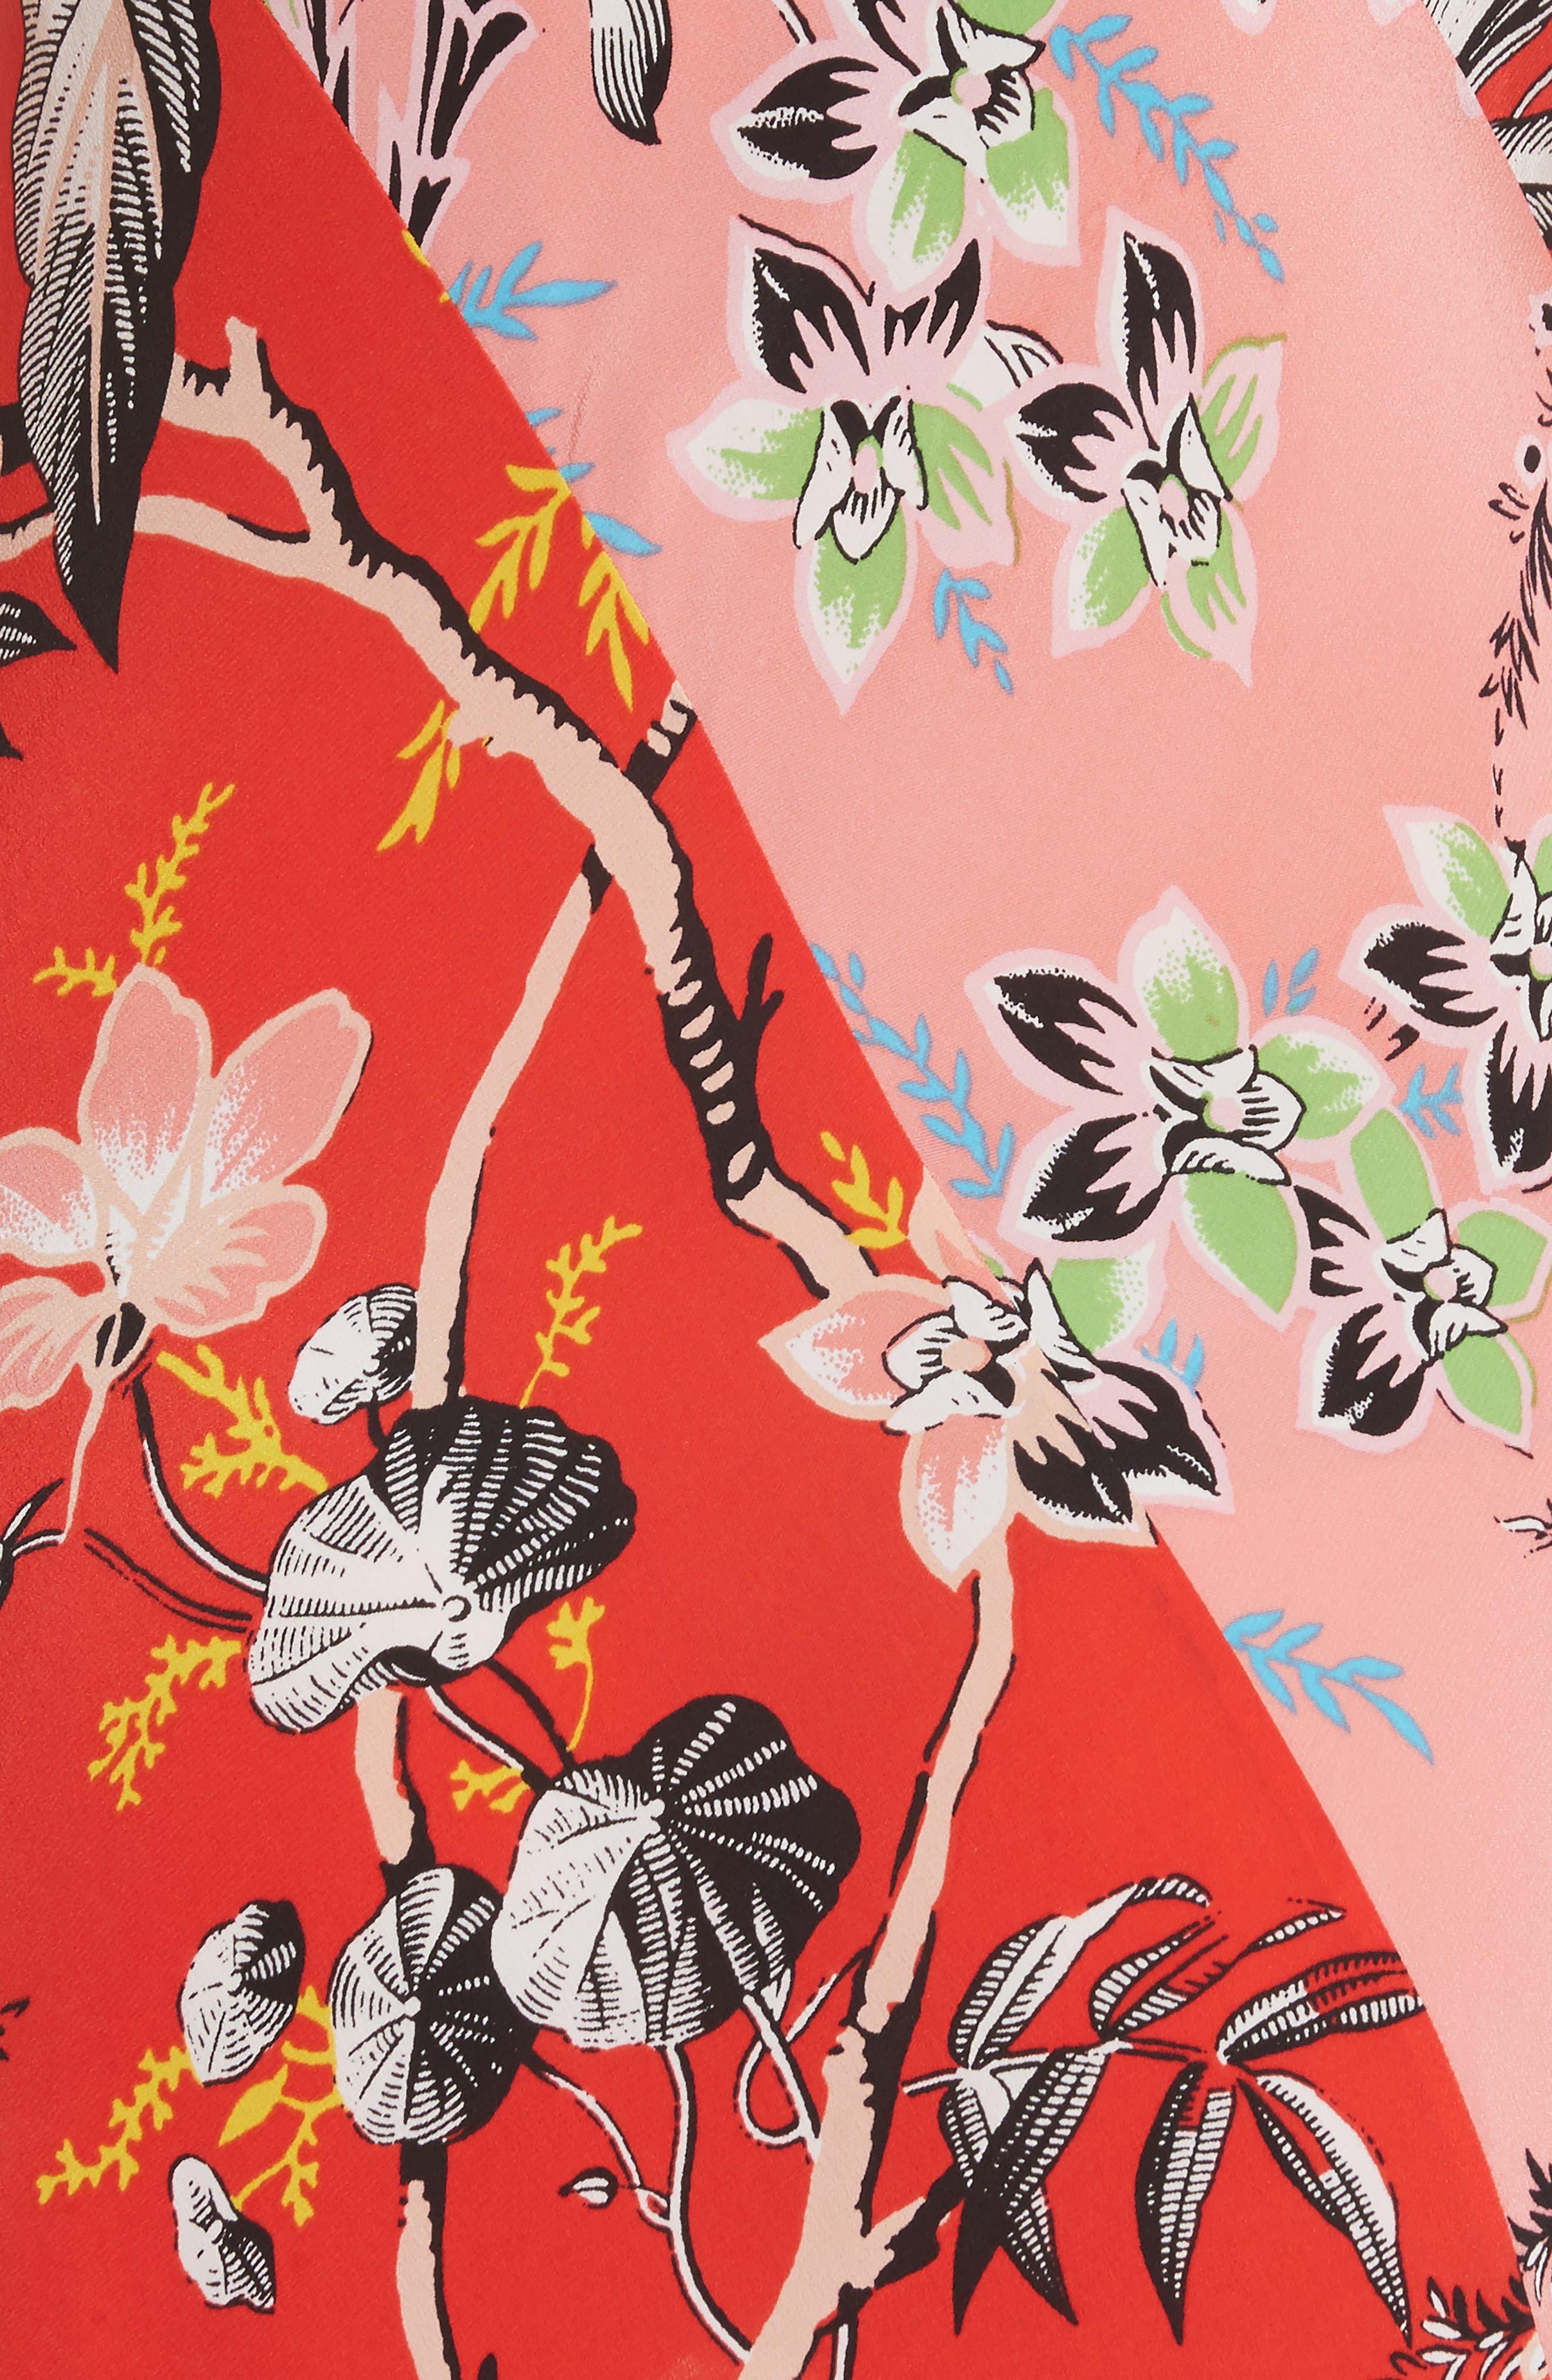 Diane von Furstenberg Paneled Silk Maxi Dress,                             Alternate thumbnail 5, color,                             Avalon Poppy/ Avalon Hyacinth